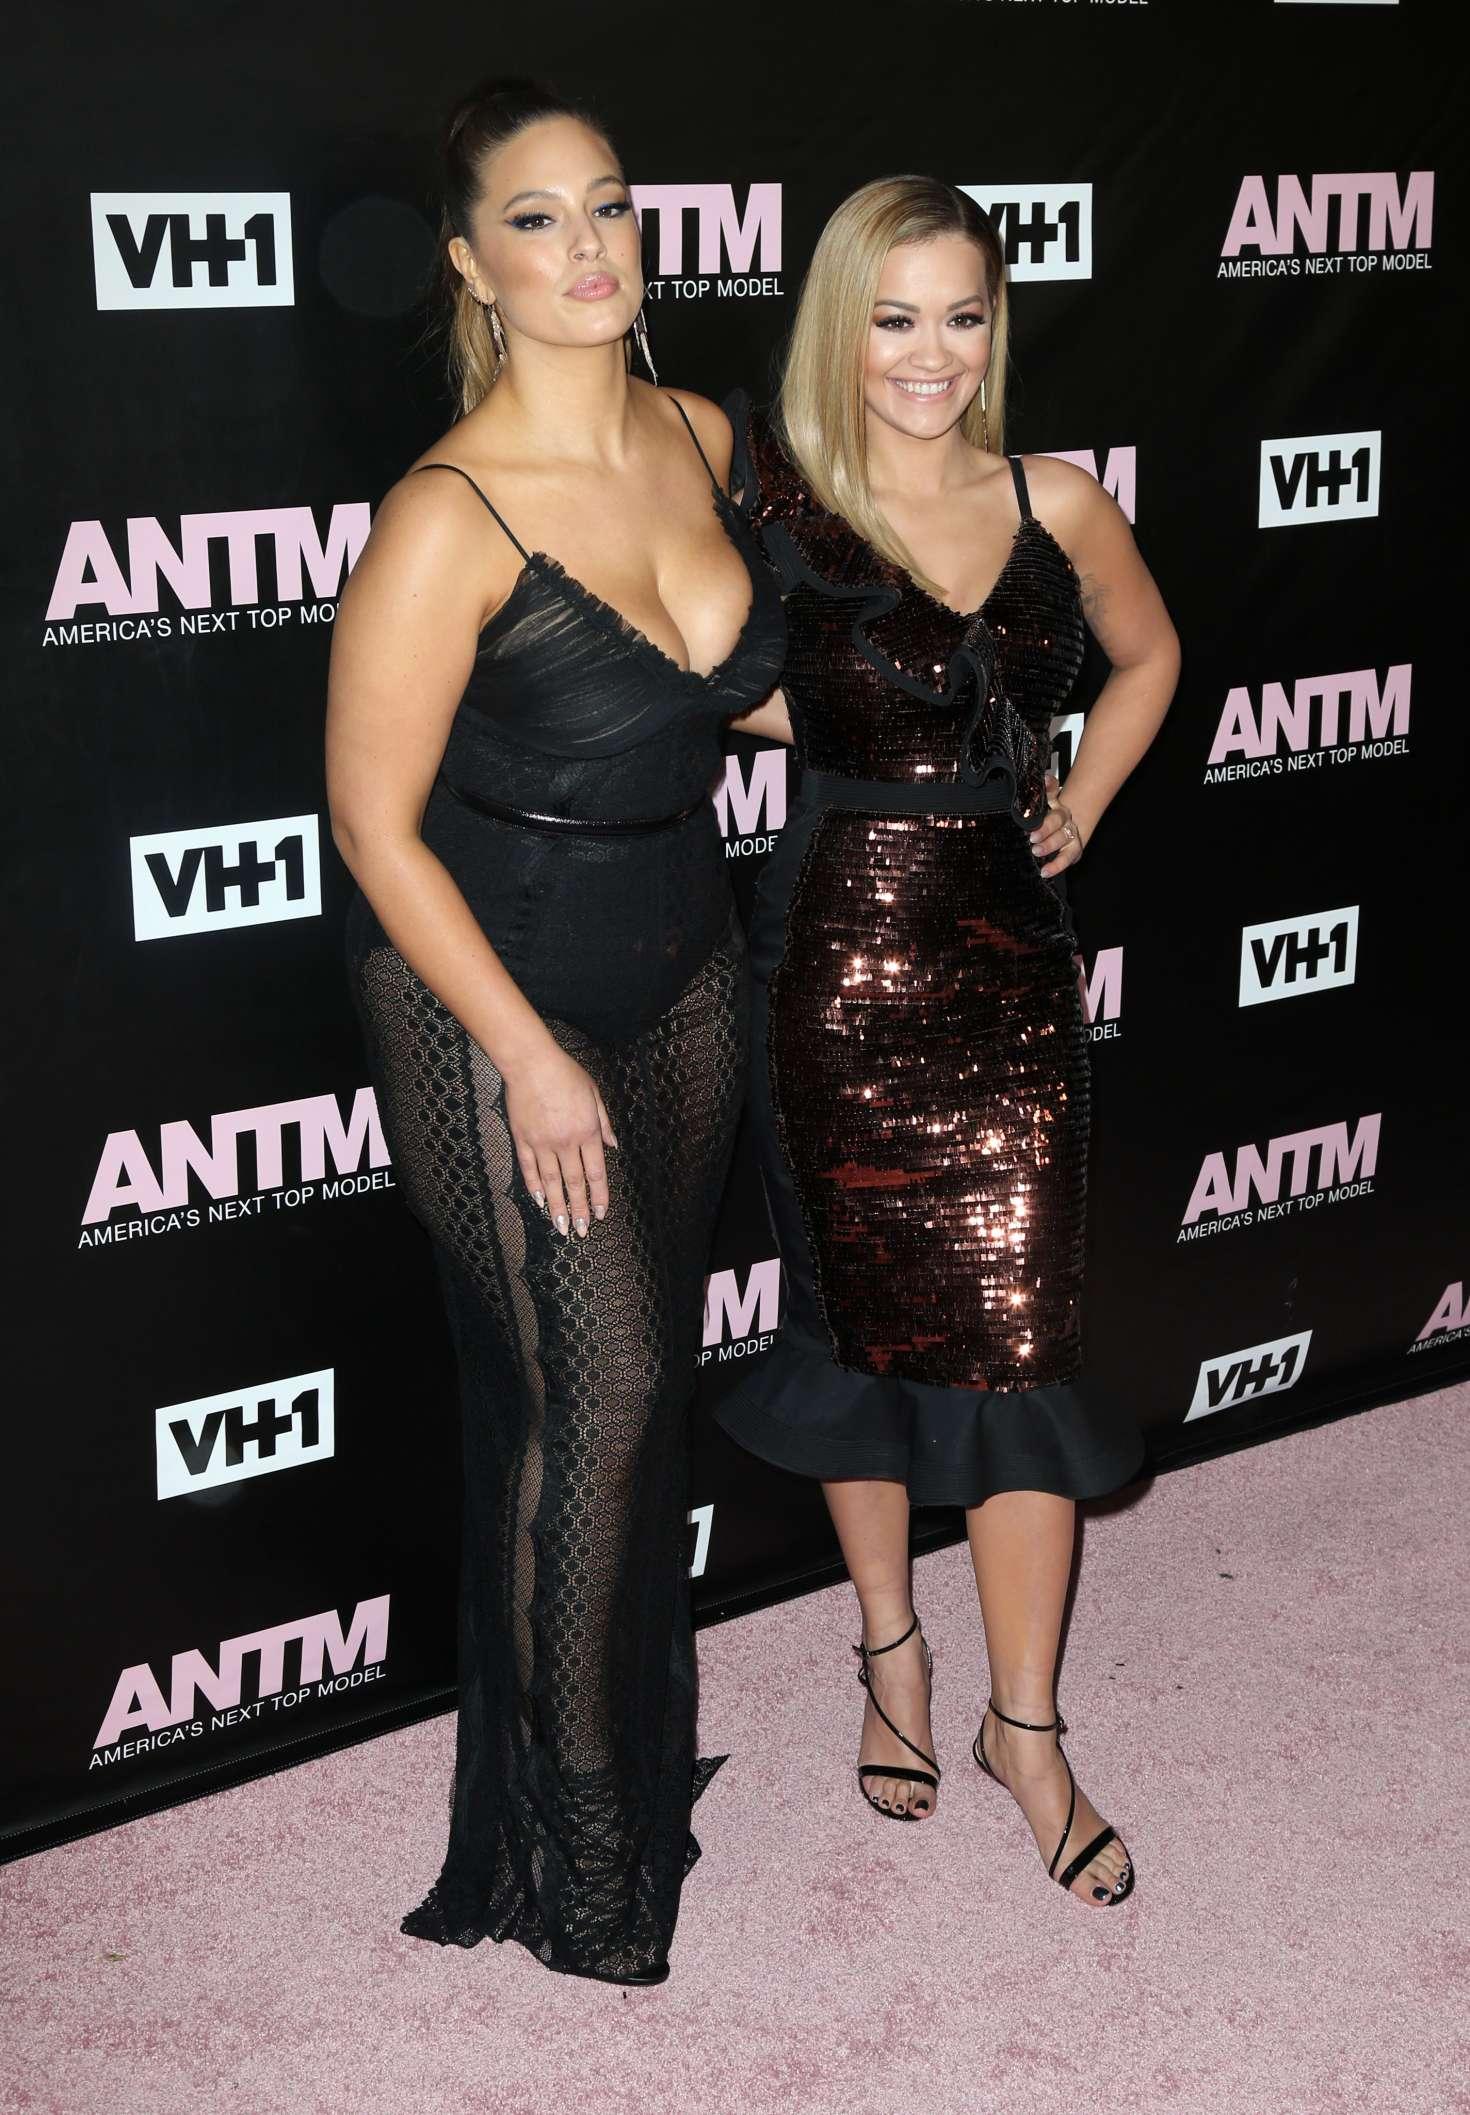 Rita Ora 2016 : Rita Ora: Americas Next Top Model Premiere Party -22